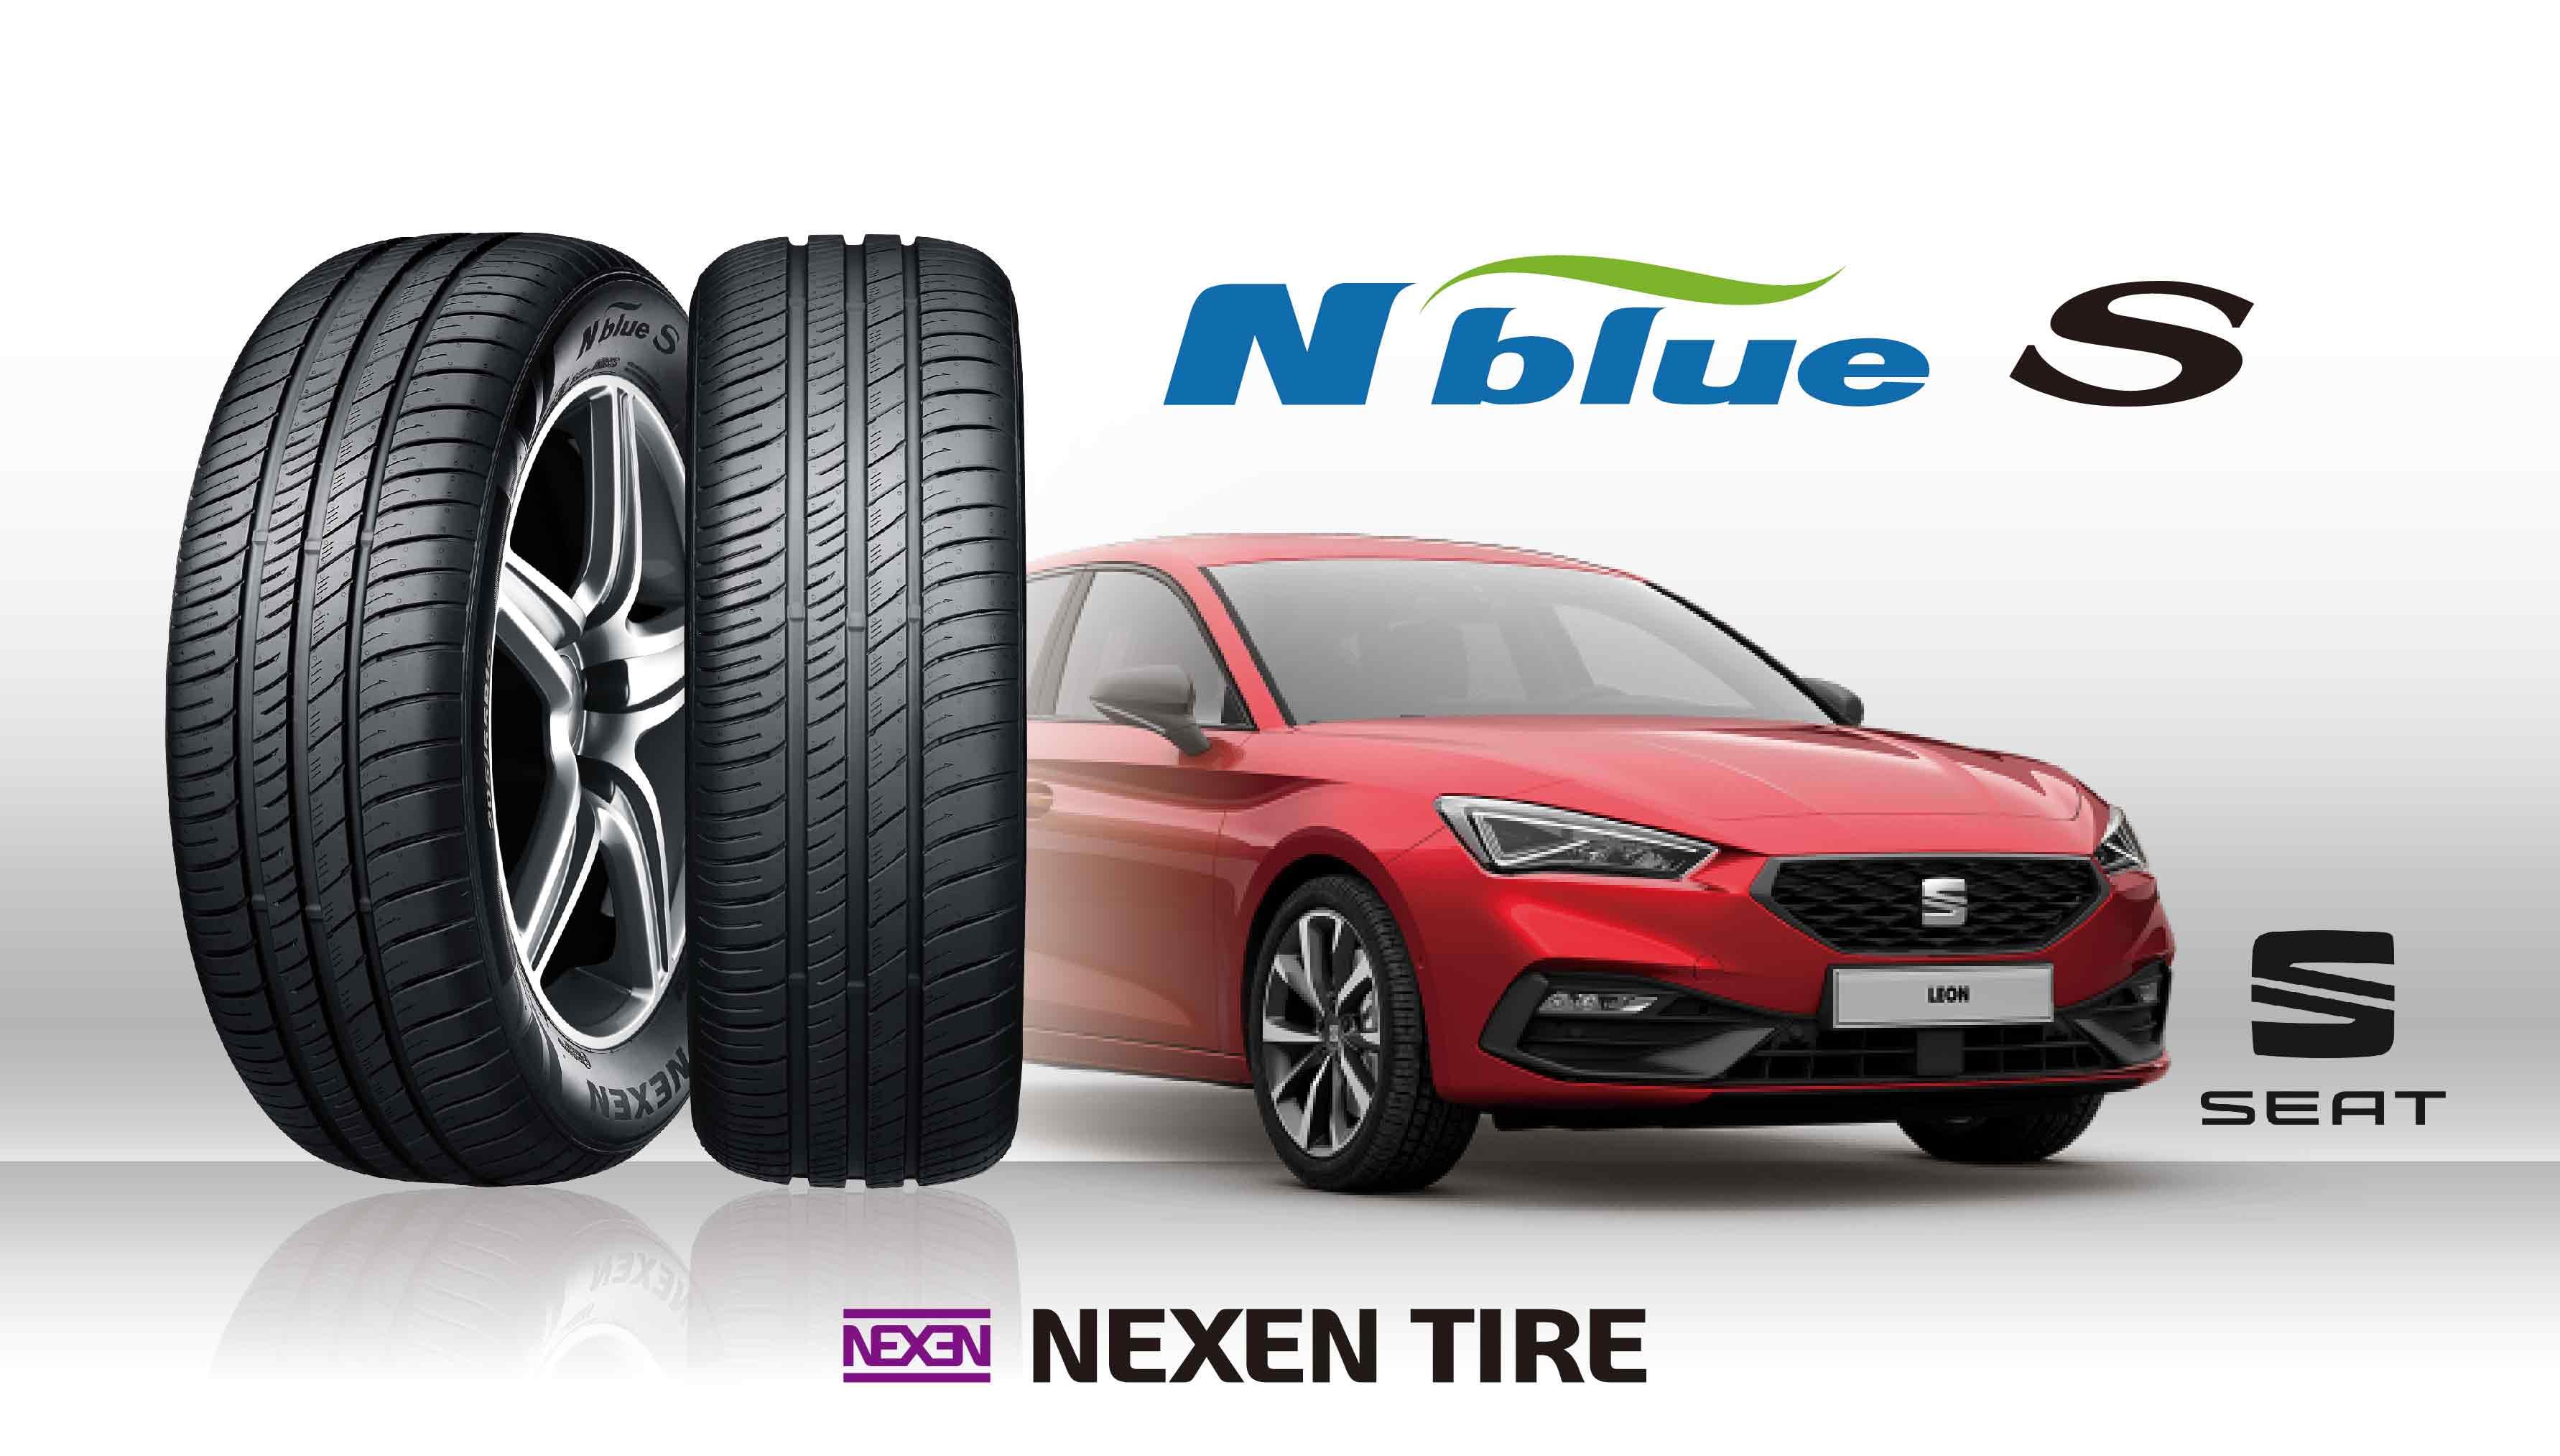 Nexen Tire Supplies Original Equipment Tires for SEAT Leon